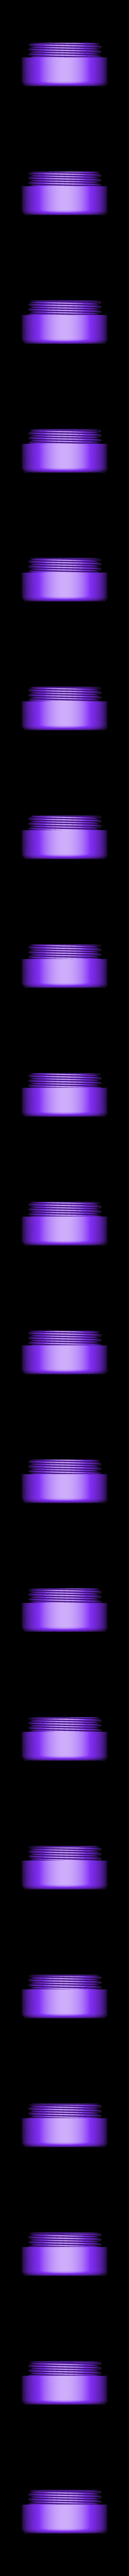 Gomme.STL Download free STL file Big pen box • 3D print template, Lyryln